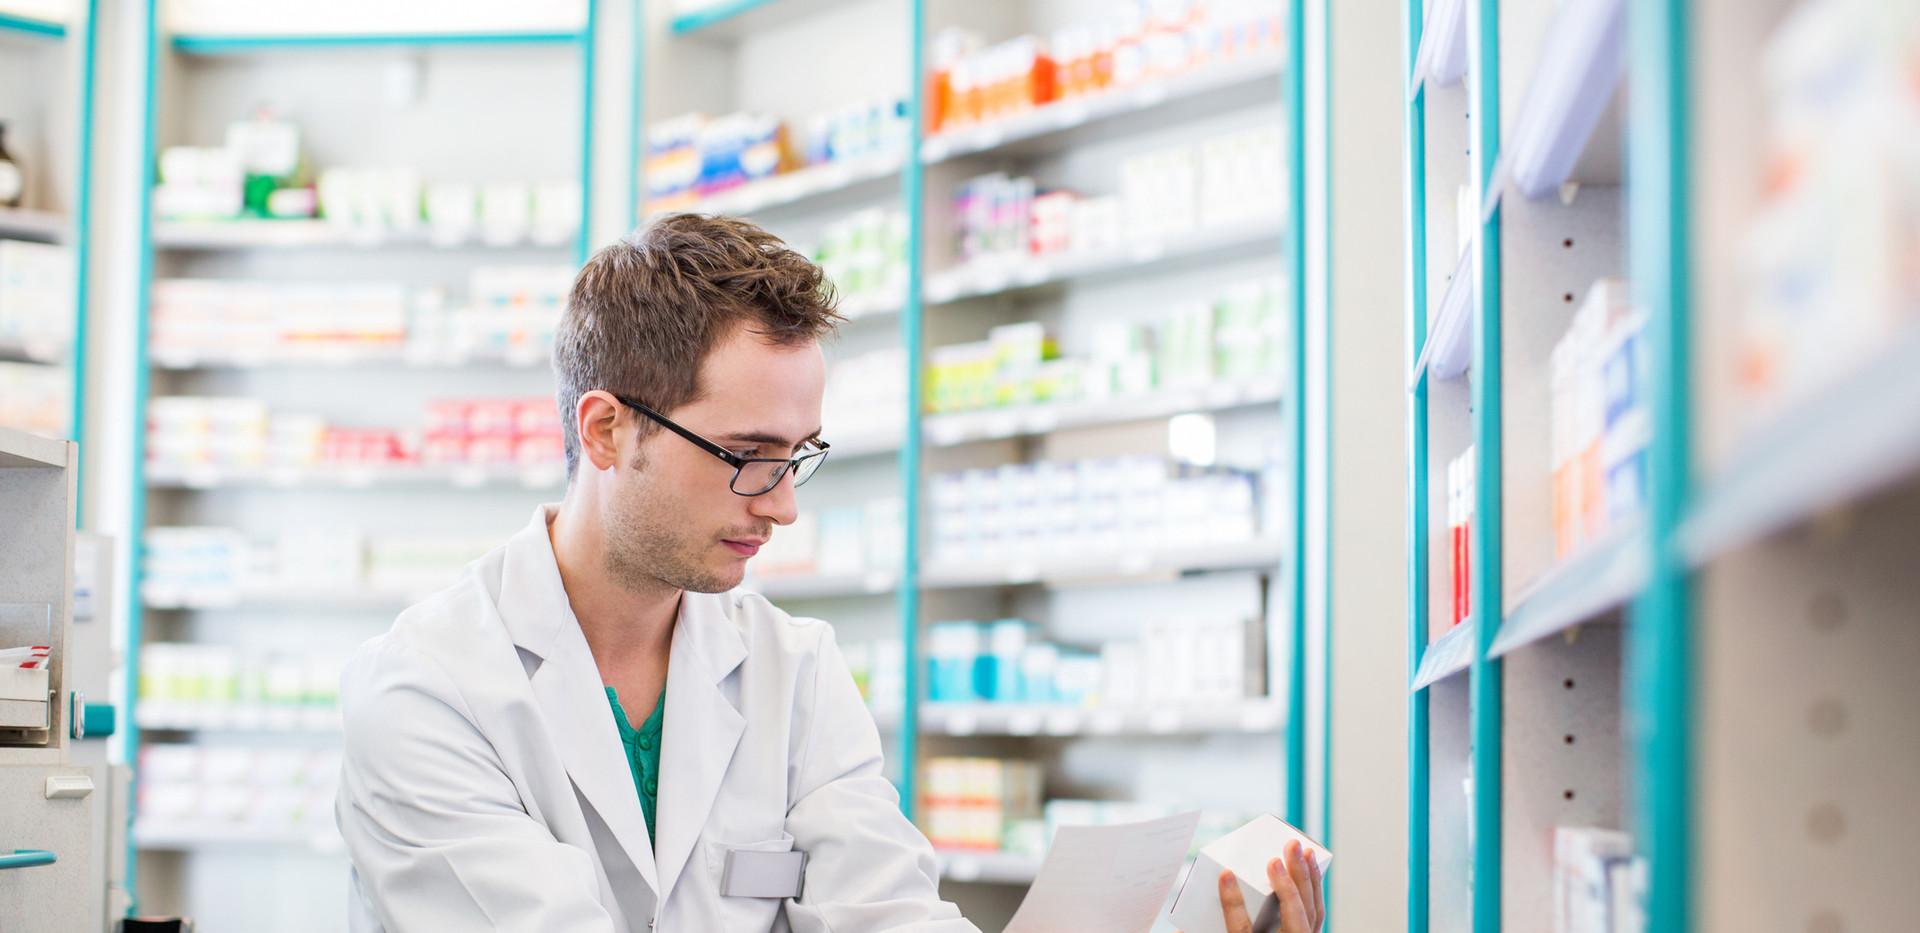 BP-Préparateur-pharmacie-2.jpg